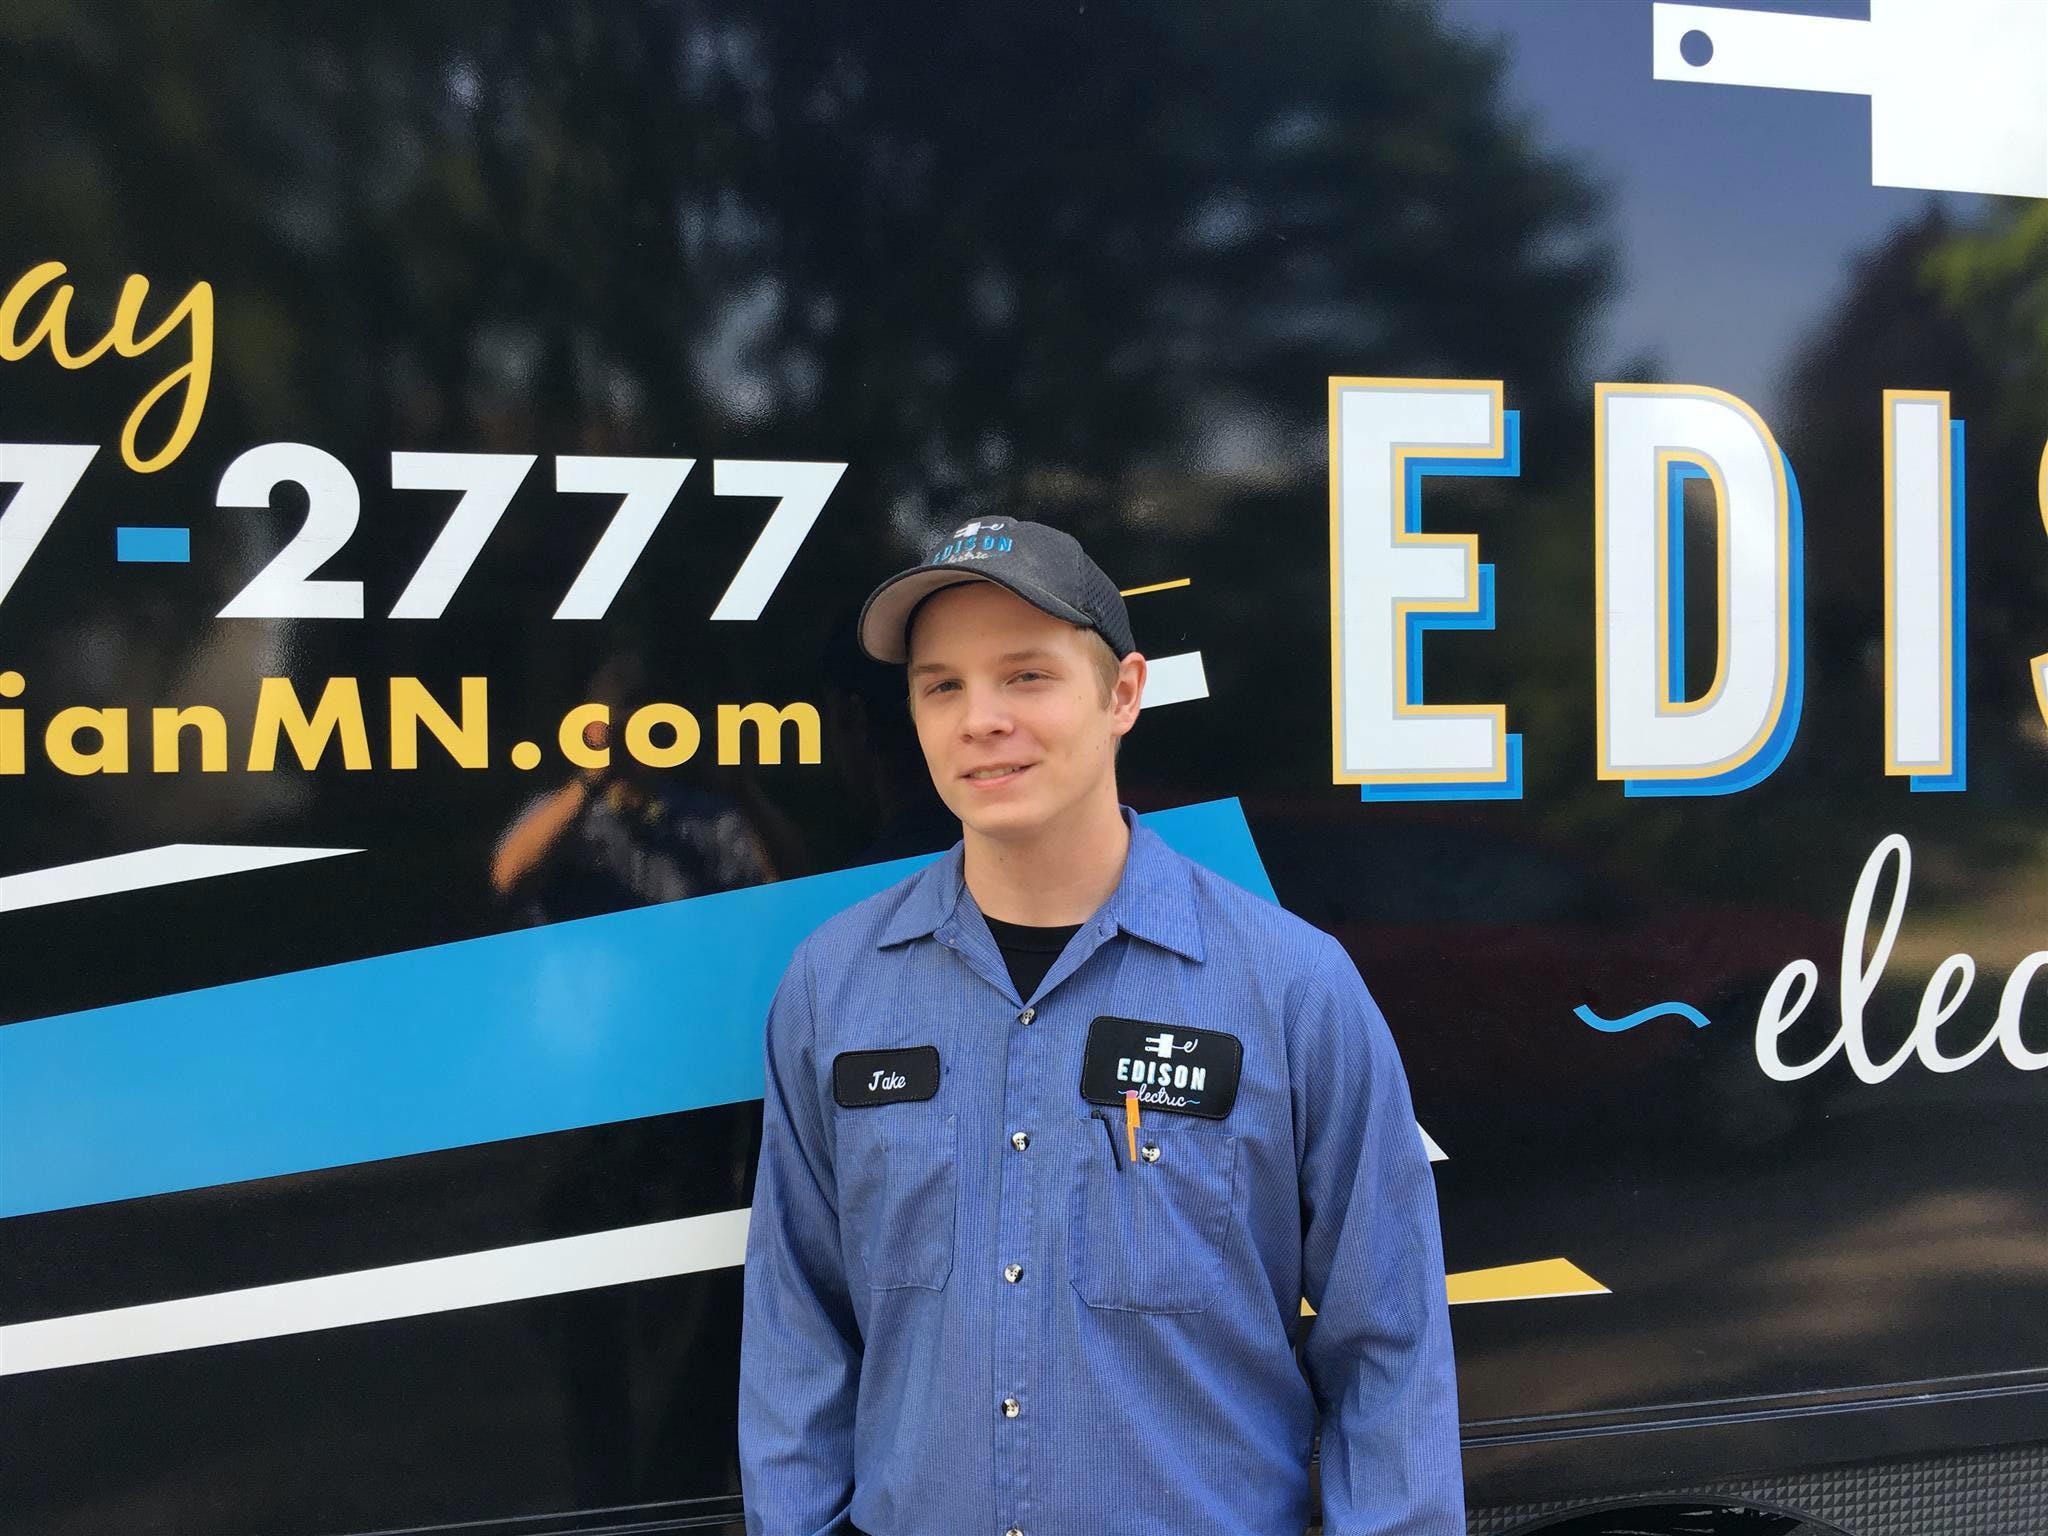 Apprentice Electrician at Edison Electric, Inc.